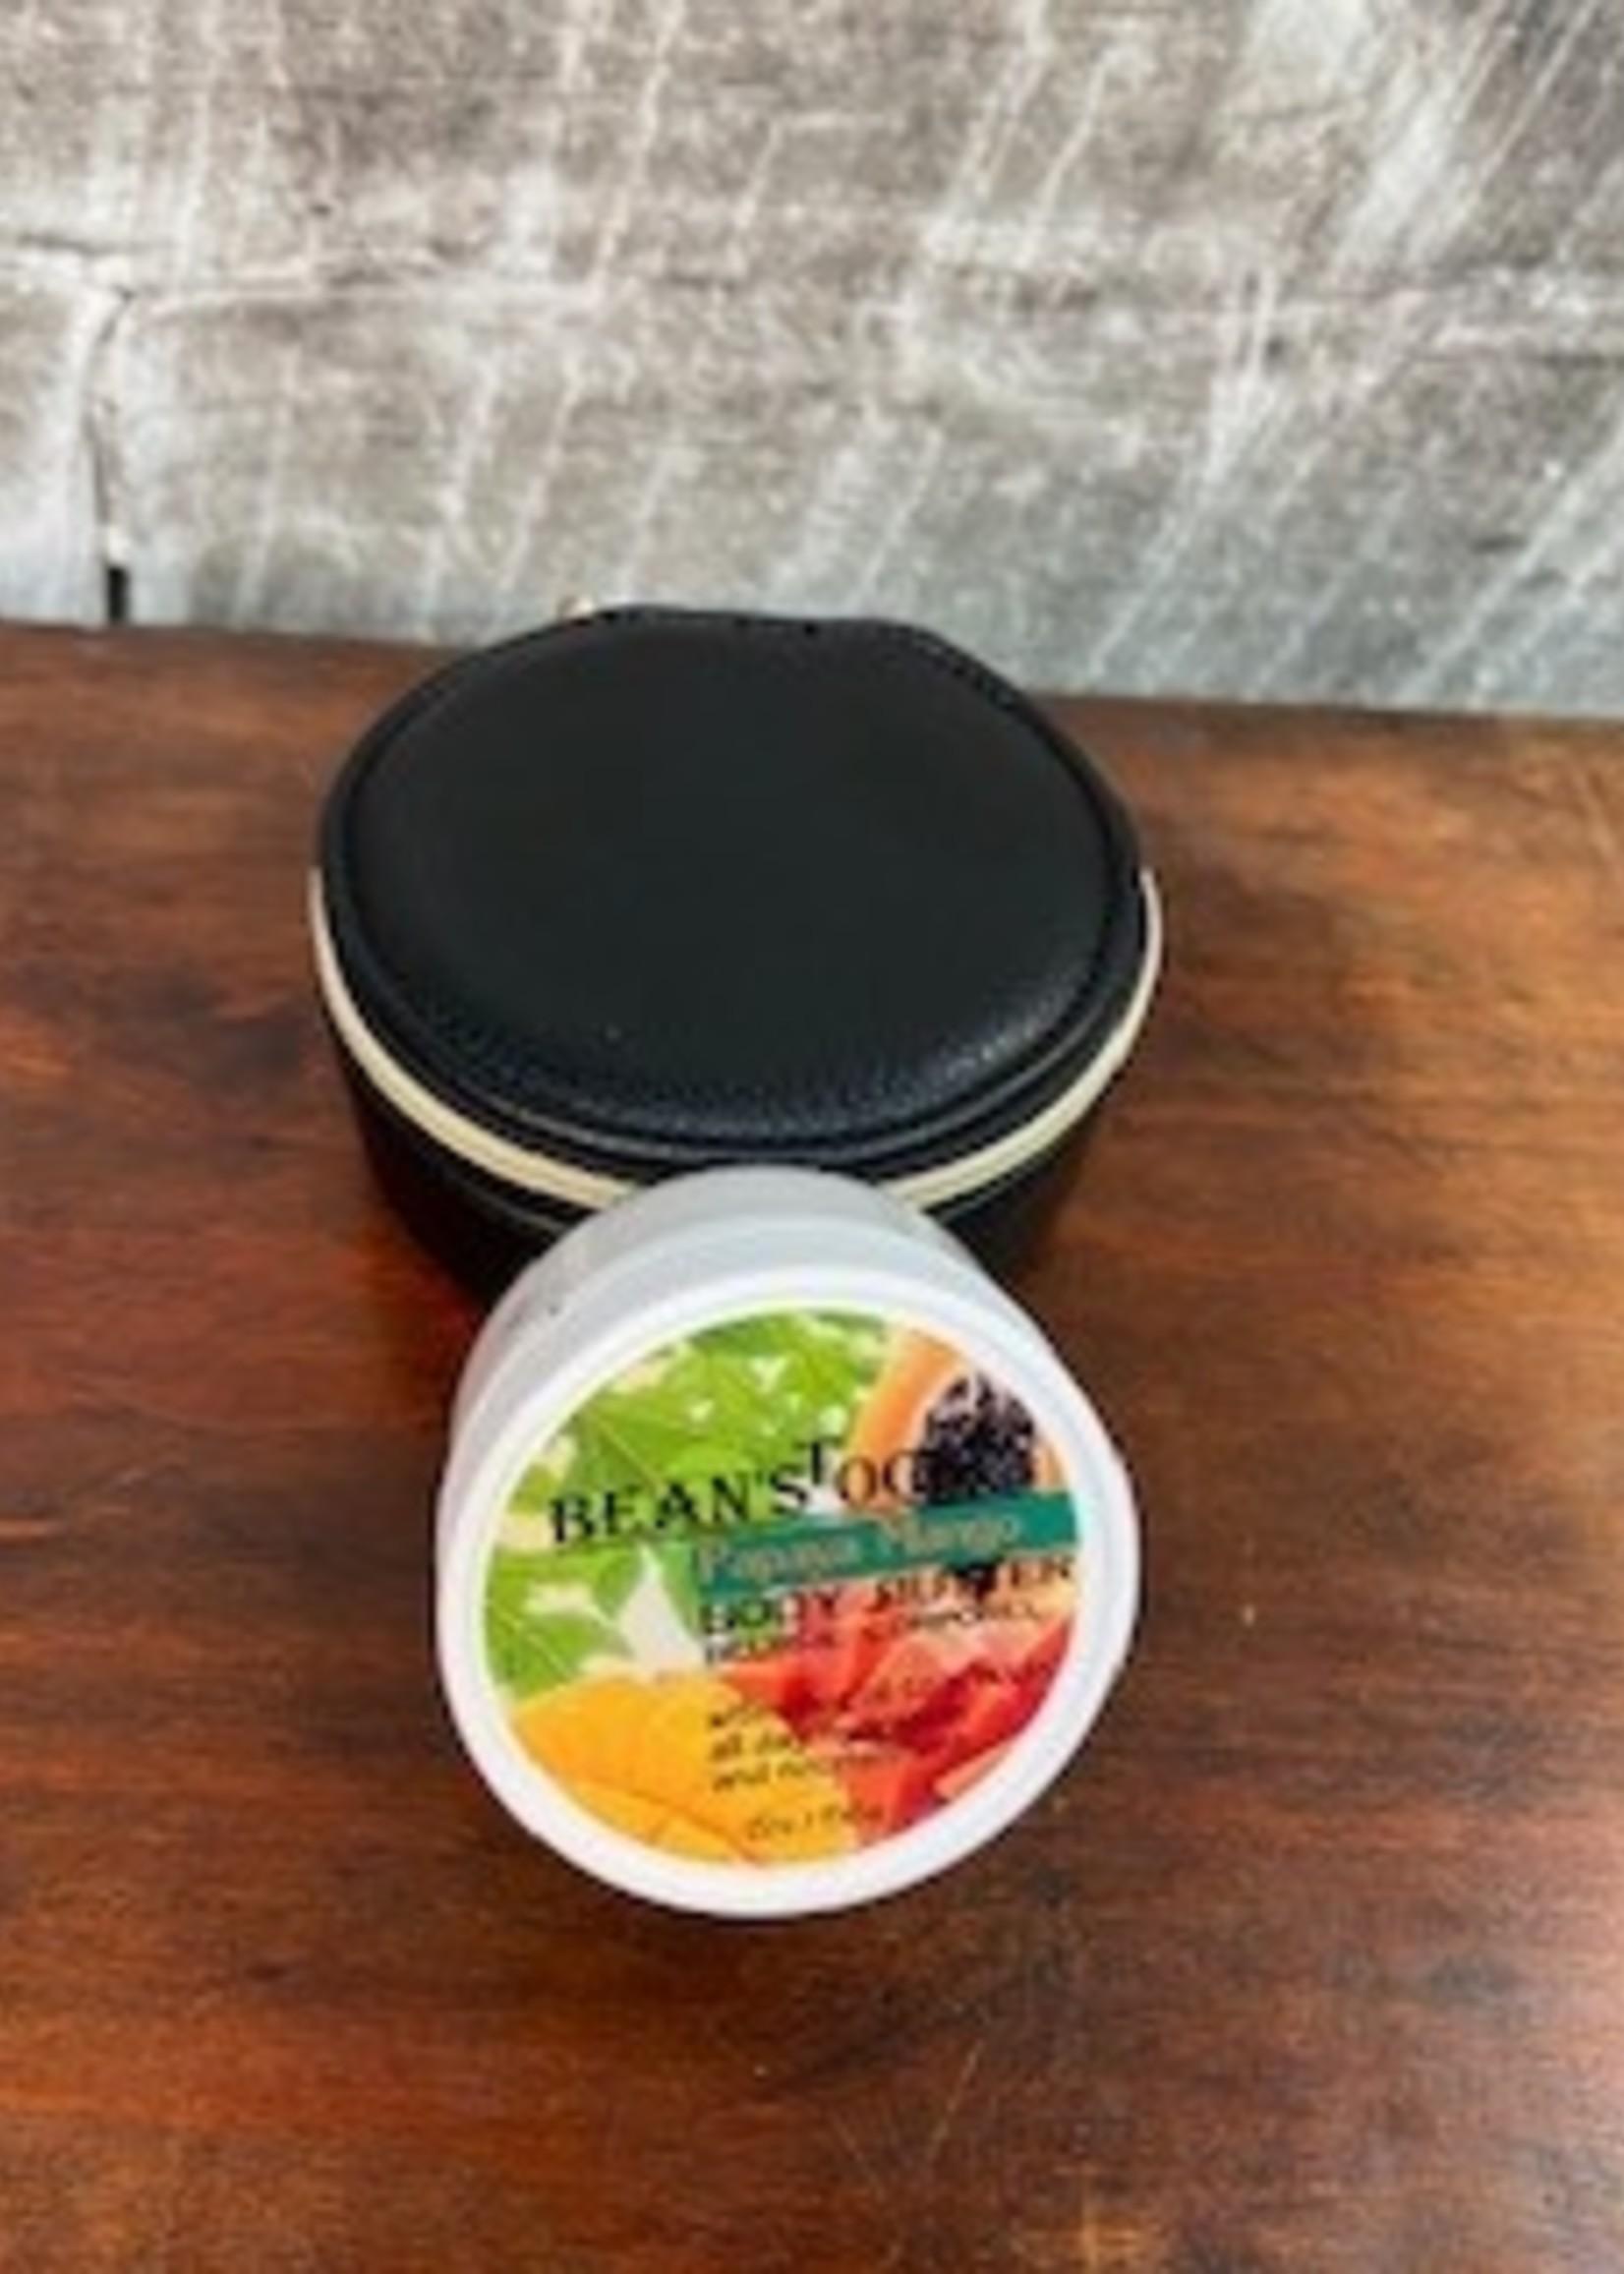 Bean stock Body Butter Travel Size Papya Mango 56g